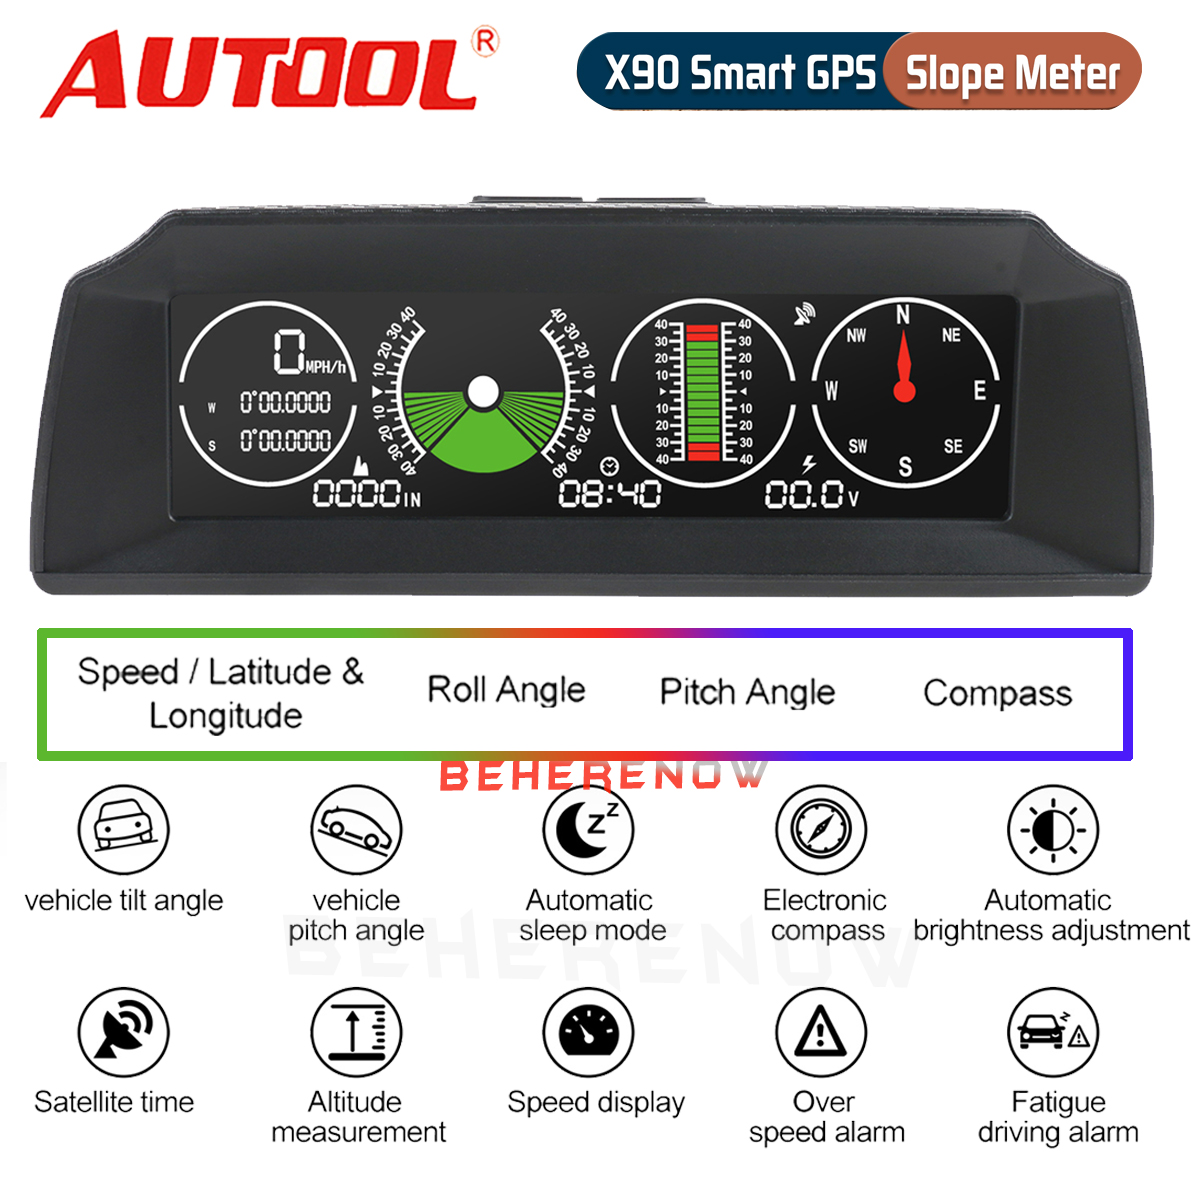 Time Direction Autool X90 Smart GPS Slope Meter Color HD LCD Car Head Display Smart Digital Meter Alarm Speed Altitude Voltage Support 12V OBDII Diesel /& Gasoline Vehicles Slope